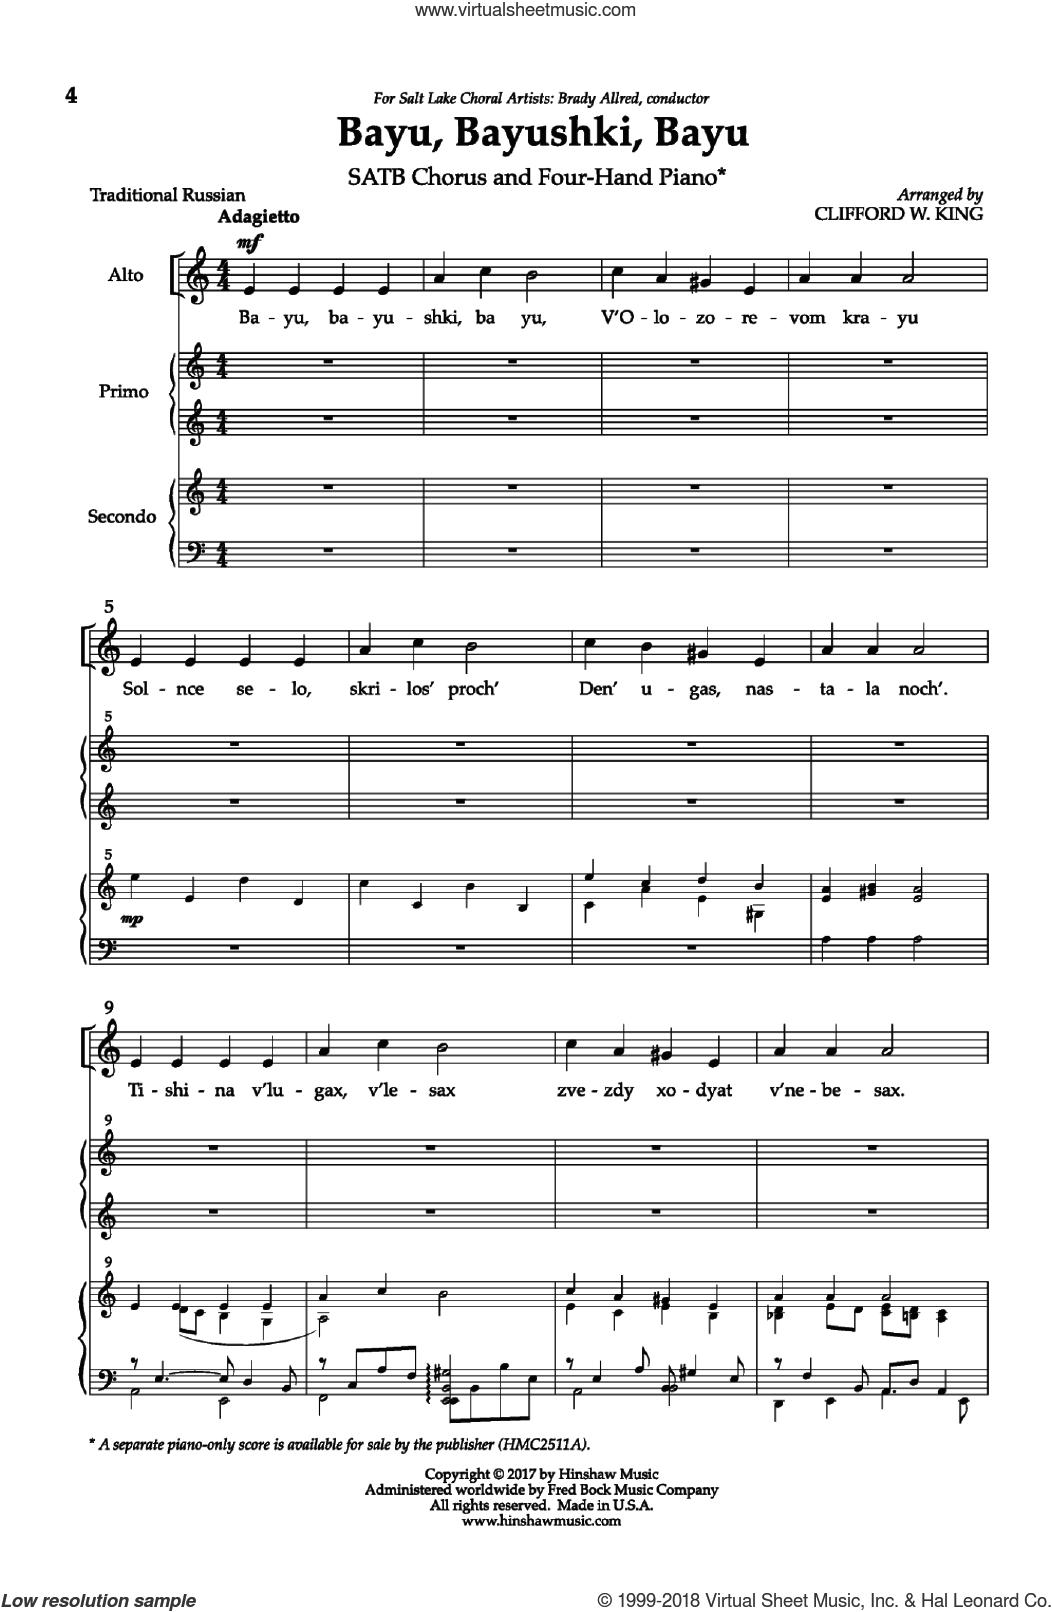 Bayu, Bayushki, Bayu sheet music for choir by Clifford W. King and Andre de Quadros, intermediate skill level